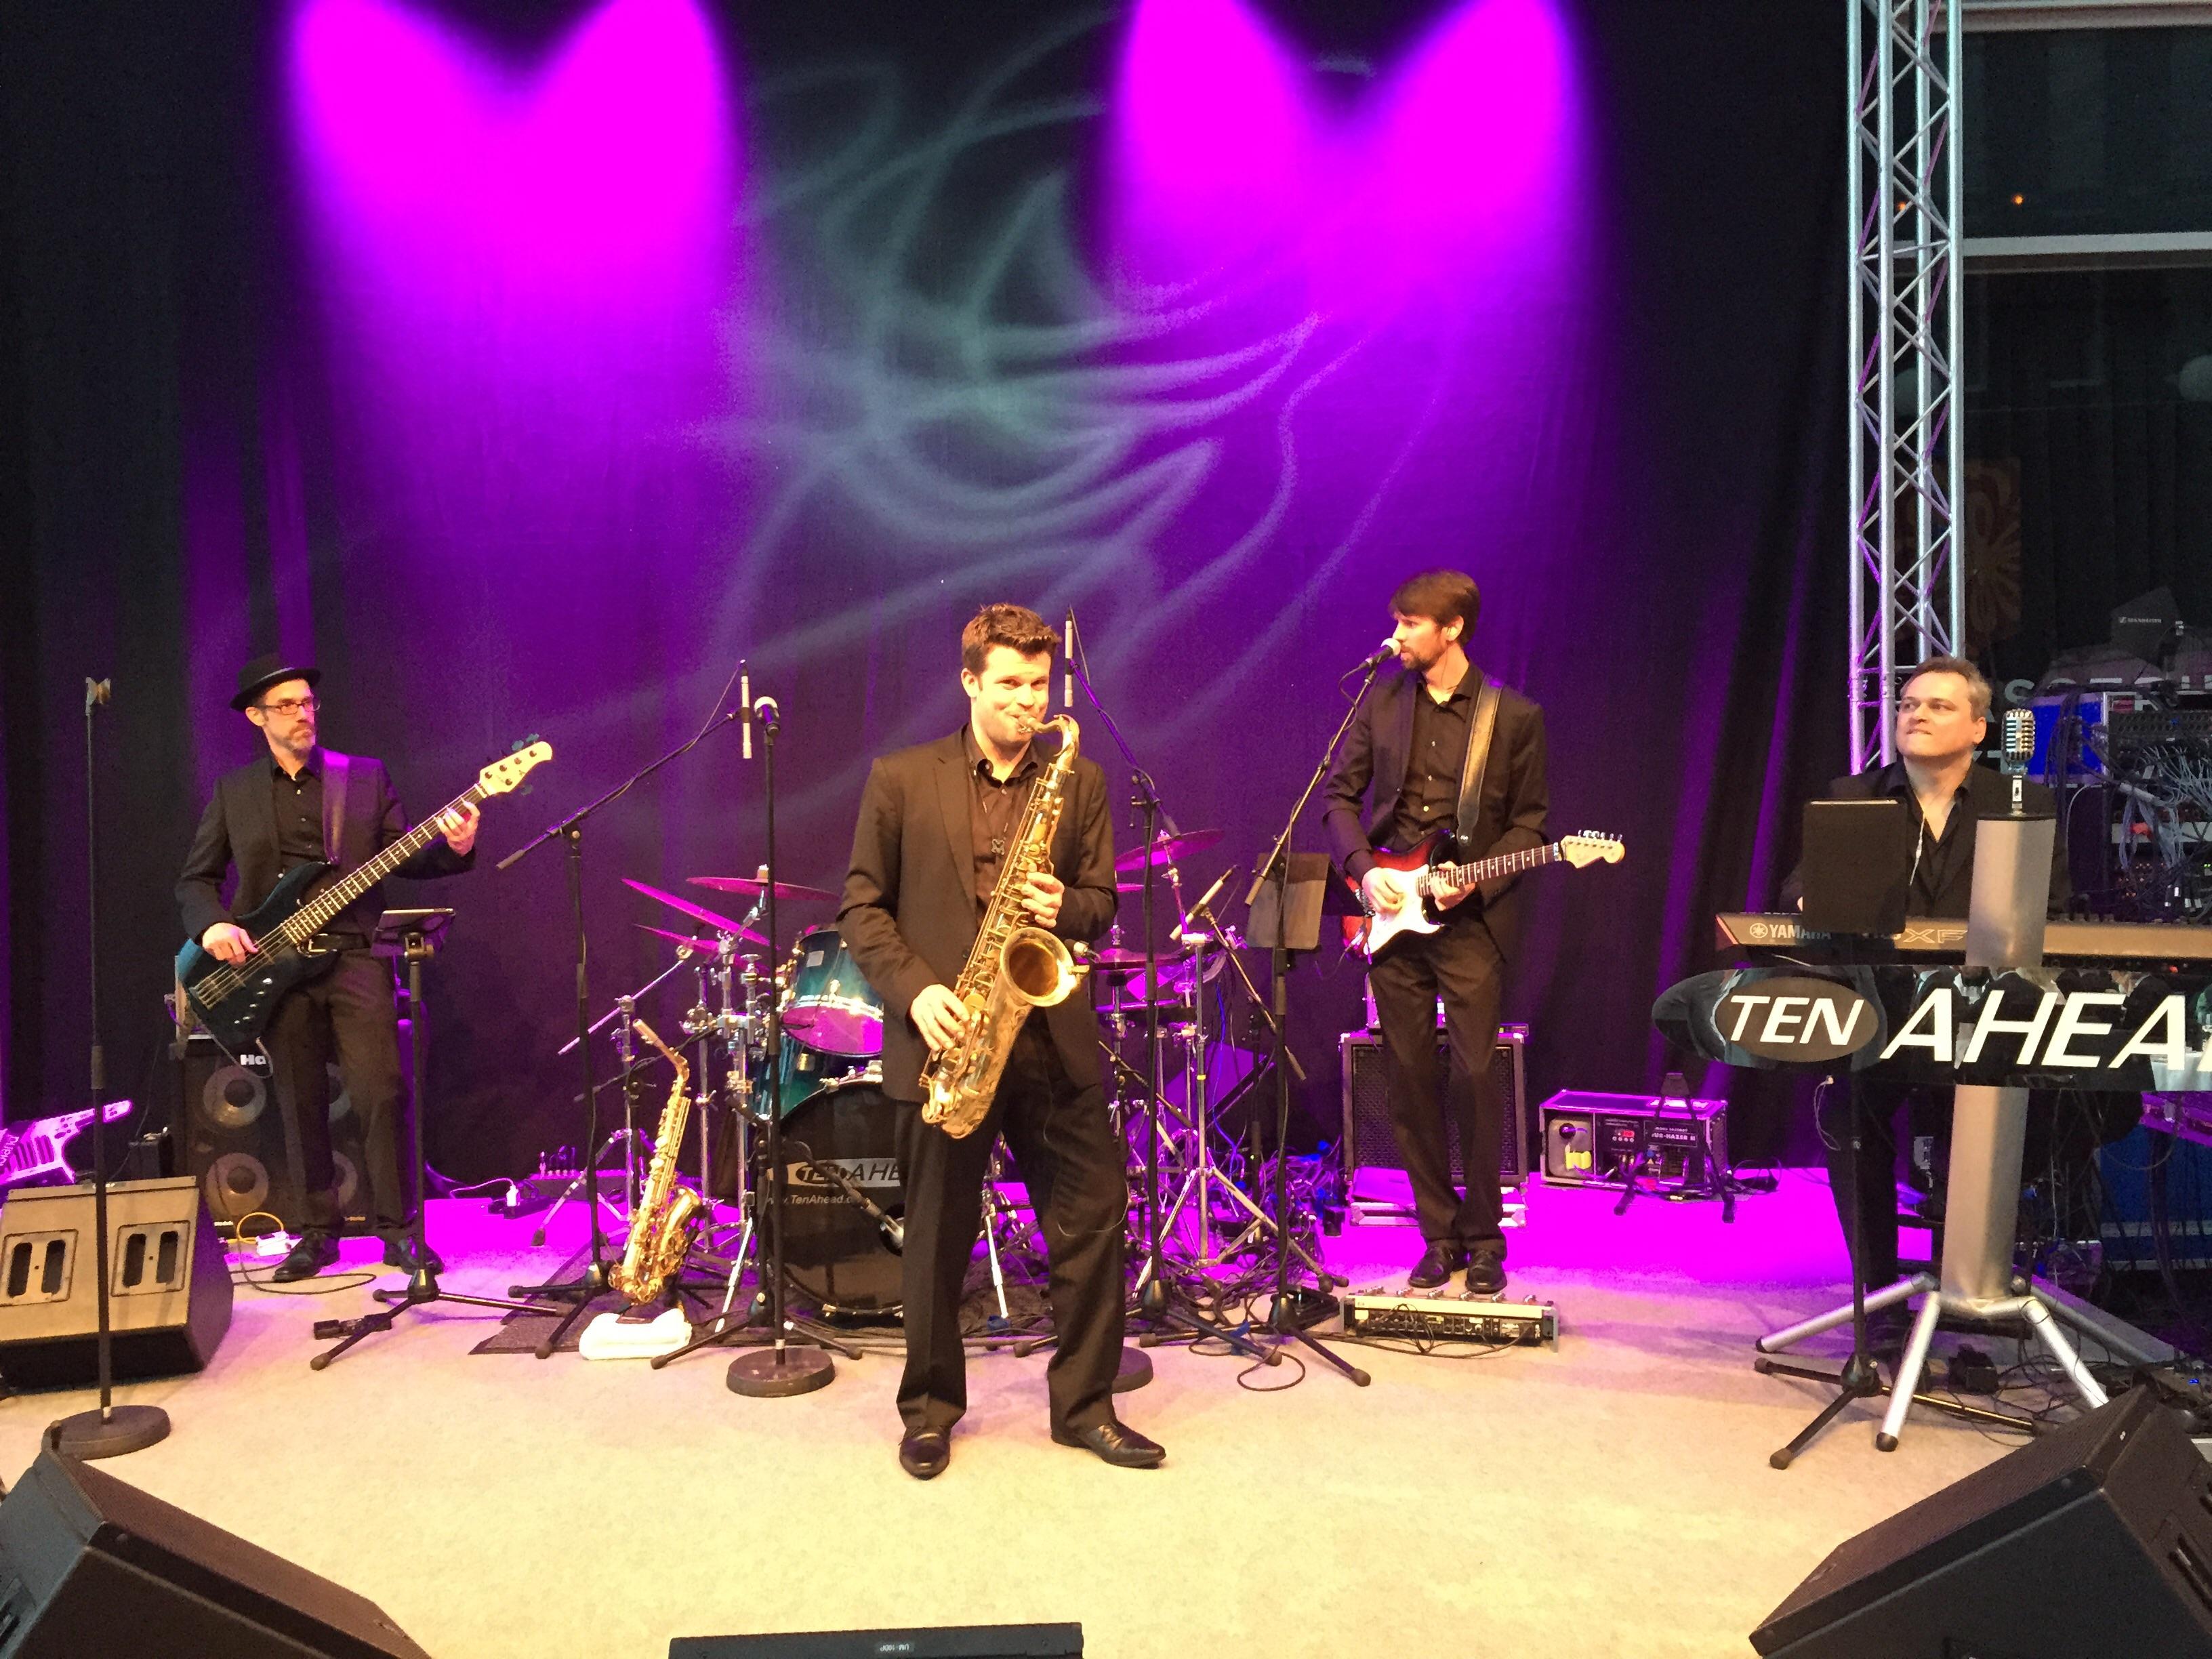 Liveband, Coverband, Partyband, ten ahead, tenahead, medi, bonn, kameha, grand